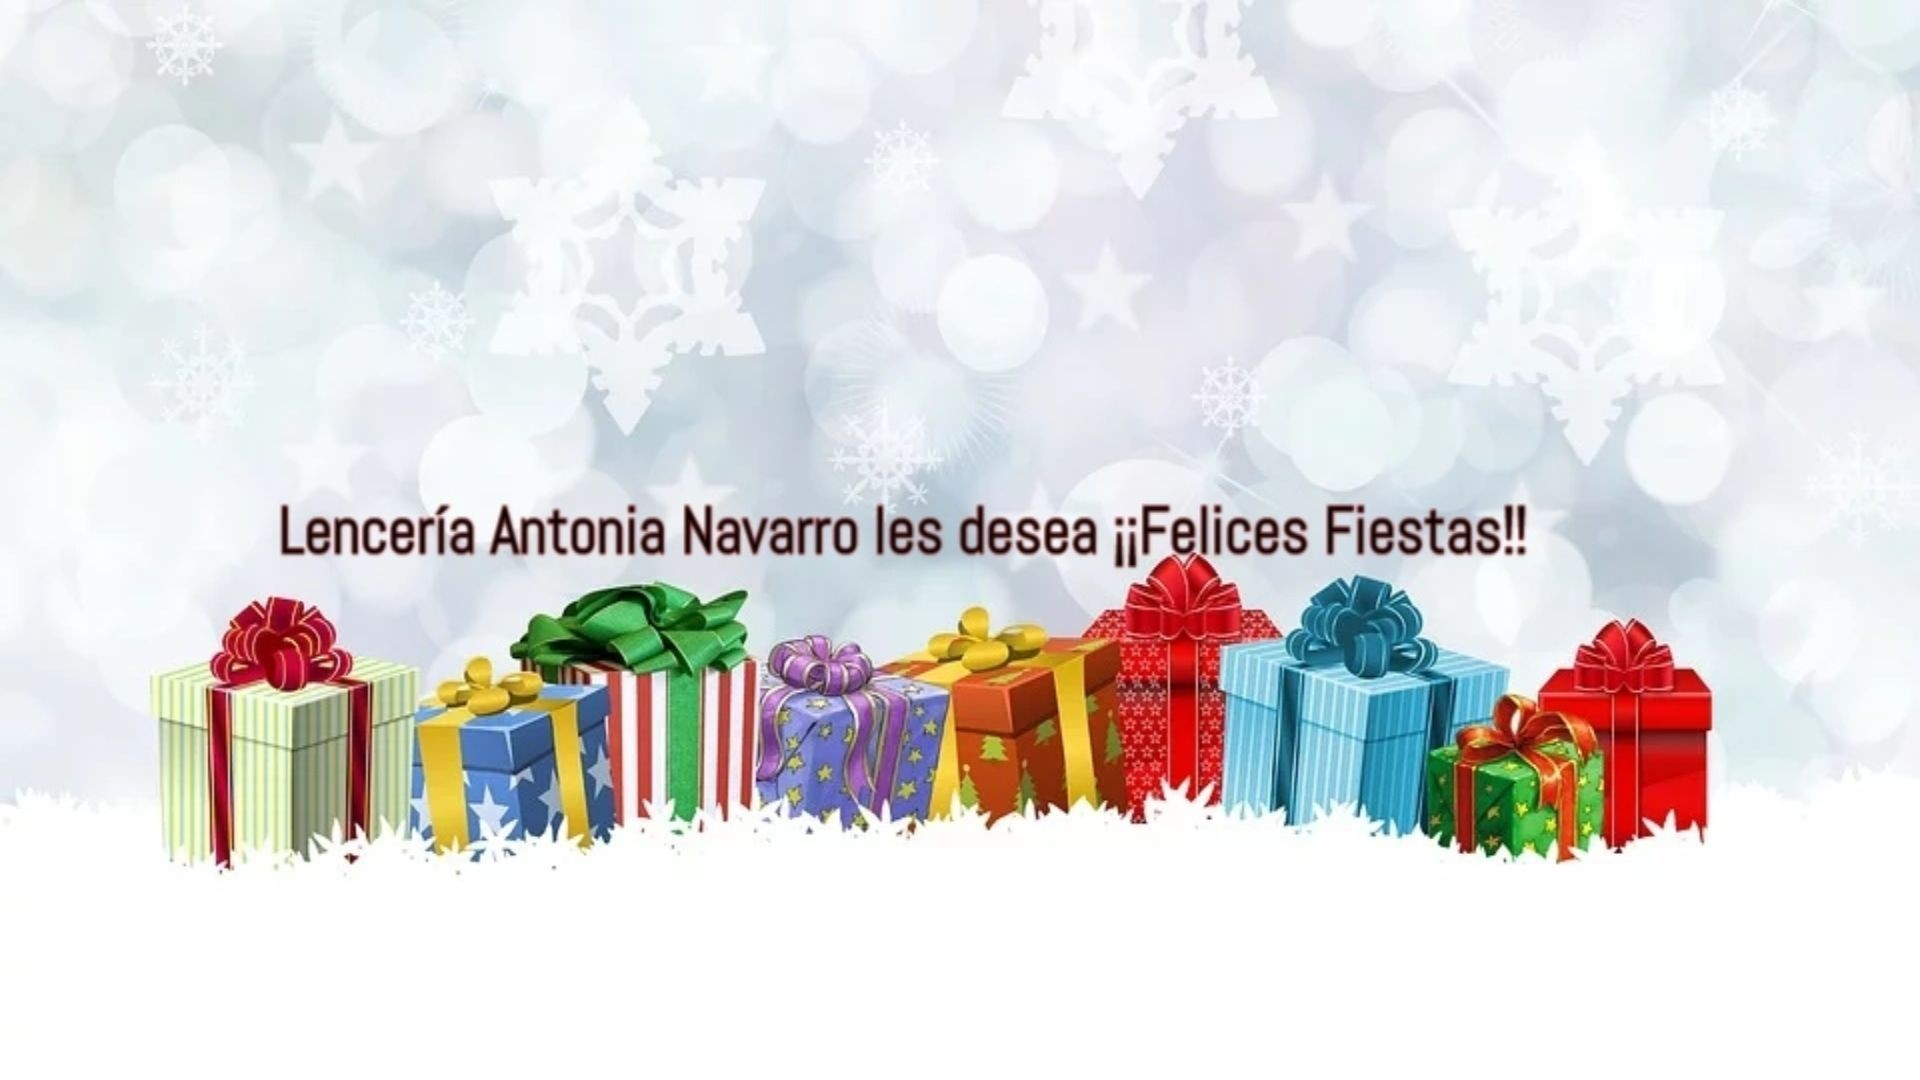 gift-3030279_960_720 (1)